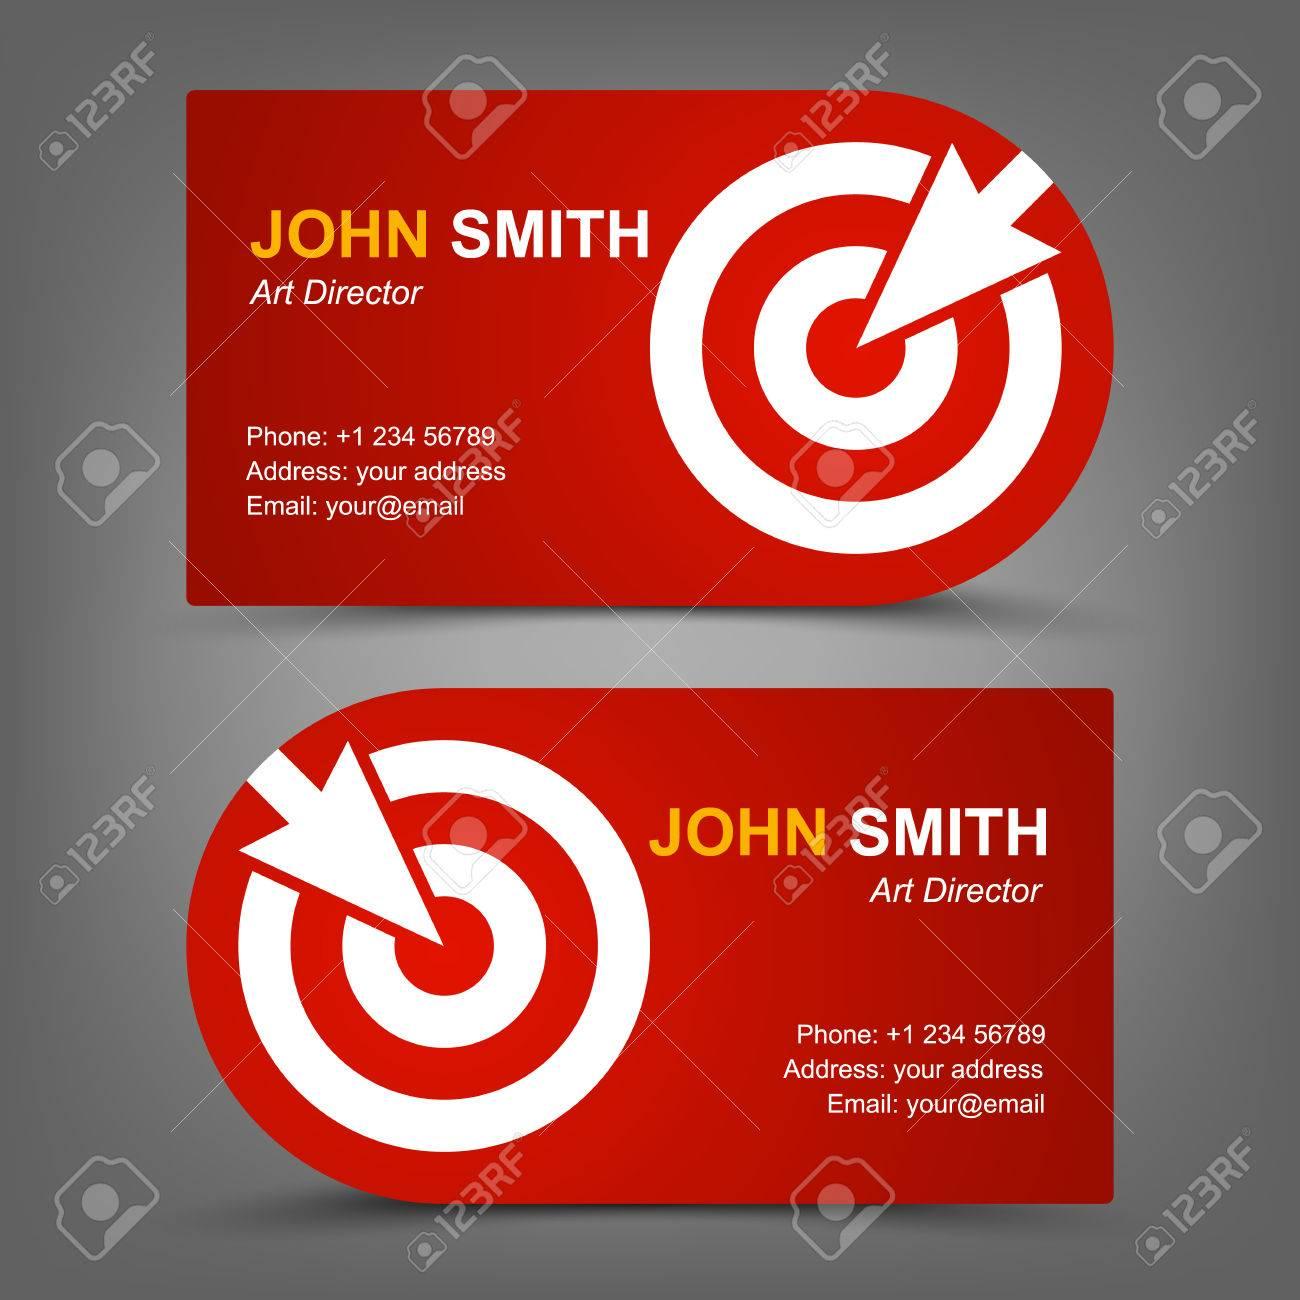 Business card target cursor royalty free cliparts vectors and business card target cursor stock vector 27335604 colourmoves